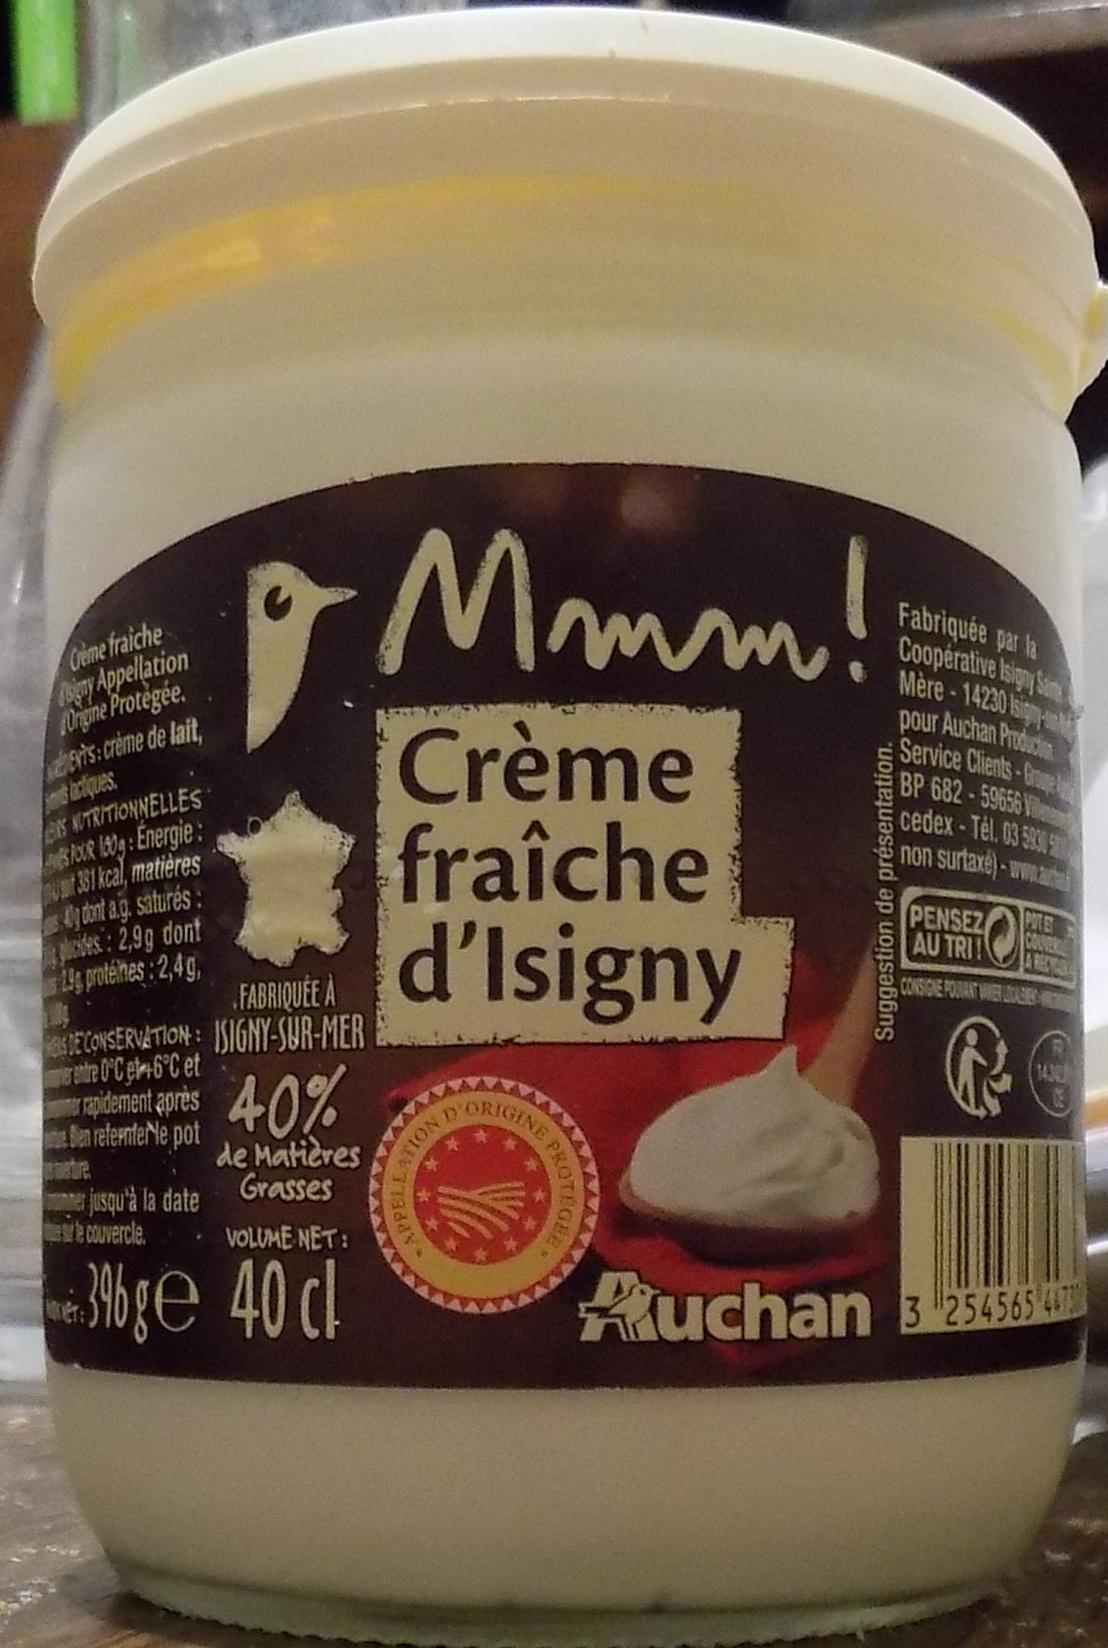 Mmm ! - Crème fraîche d'Isigny - Product - fr